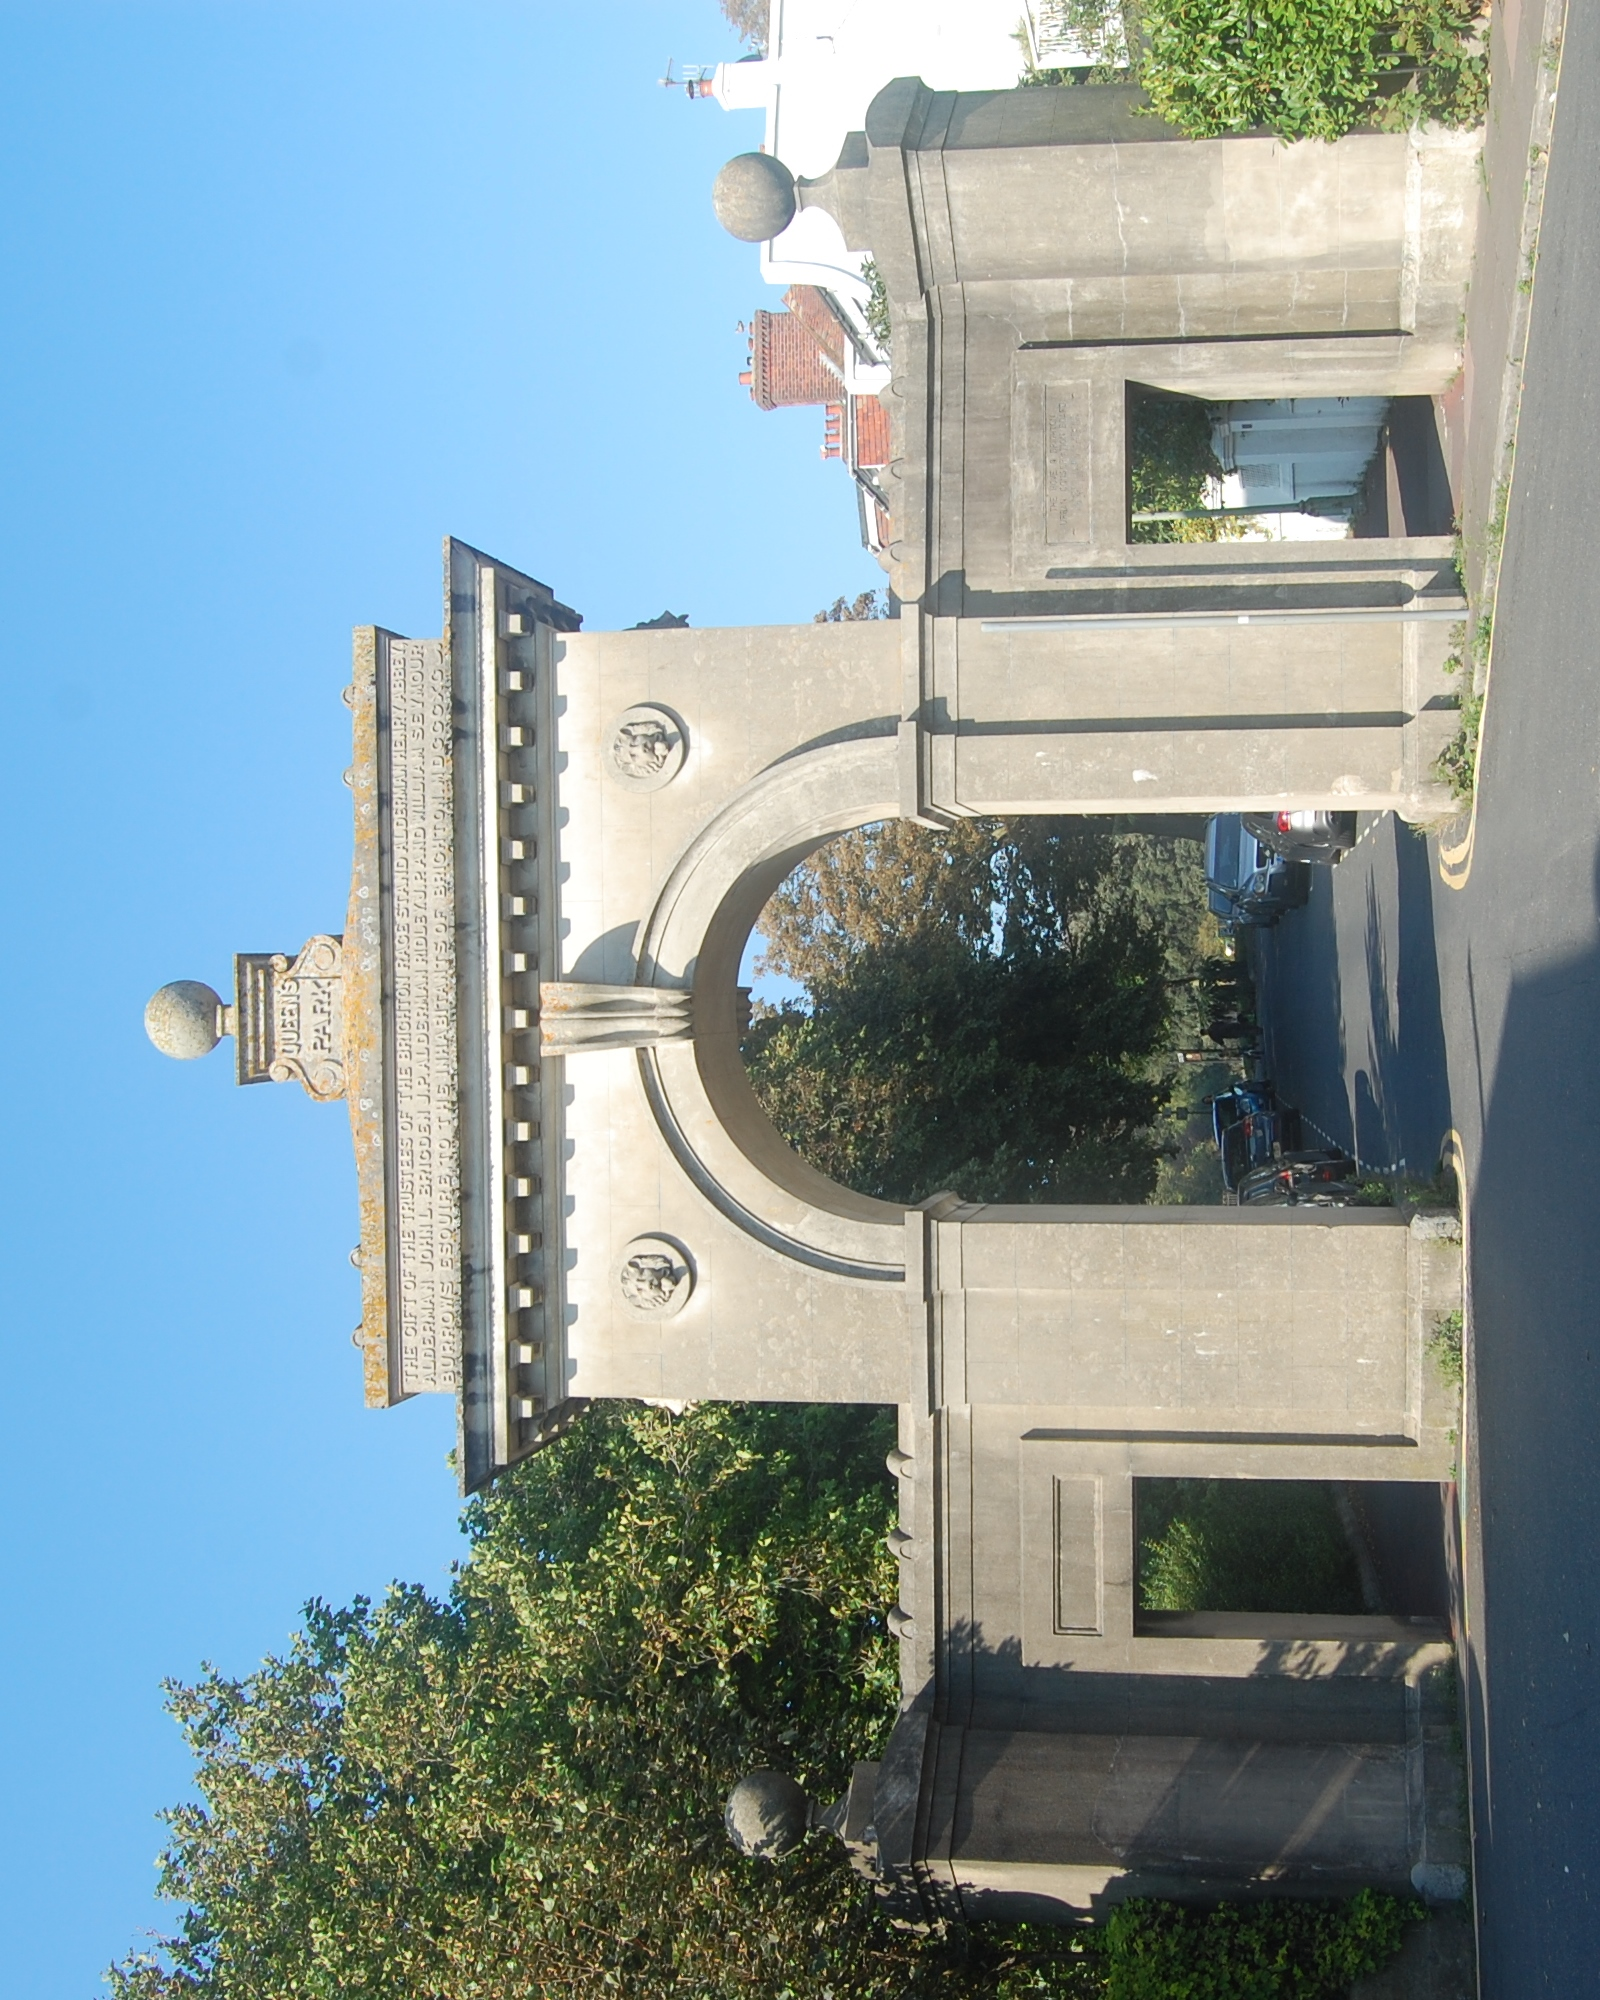 File:Park Street Gate, Park Street, Queen's Park, Brighton (NHLE Code 1380703) (August 2019) (2).JPG